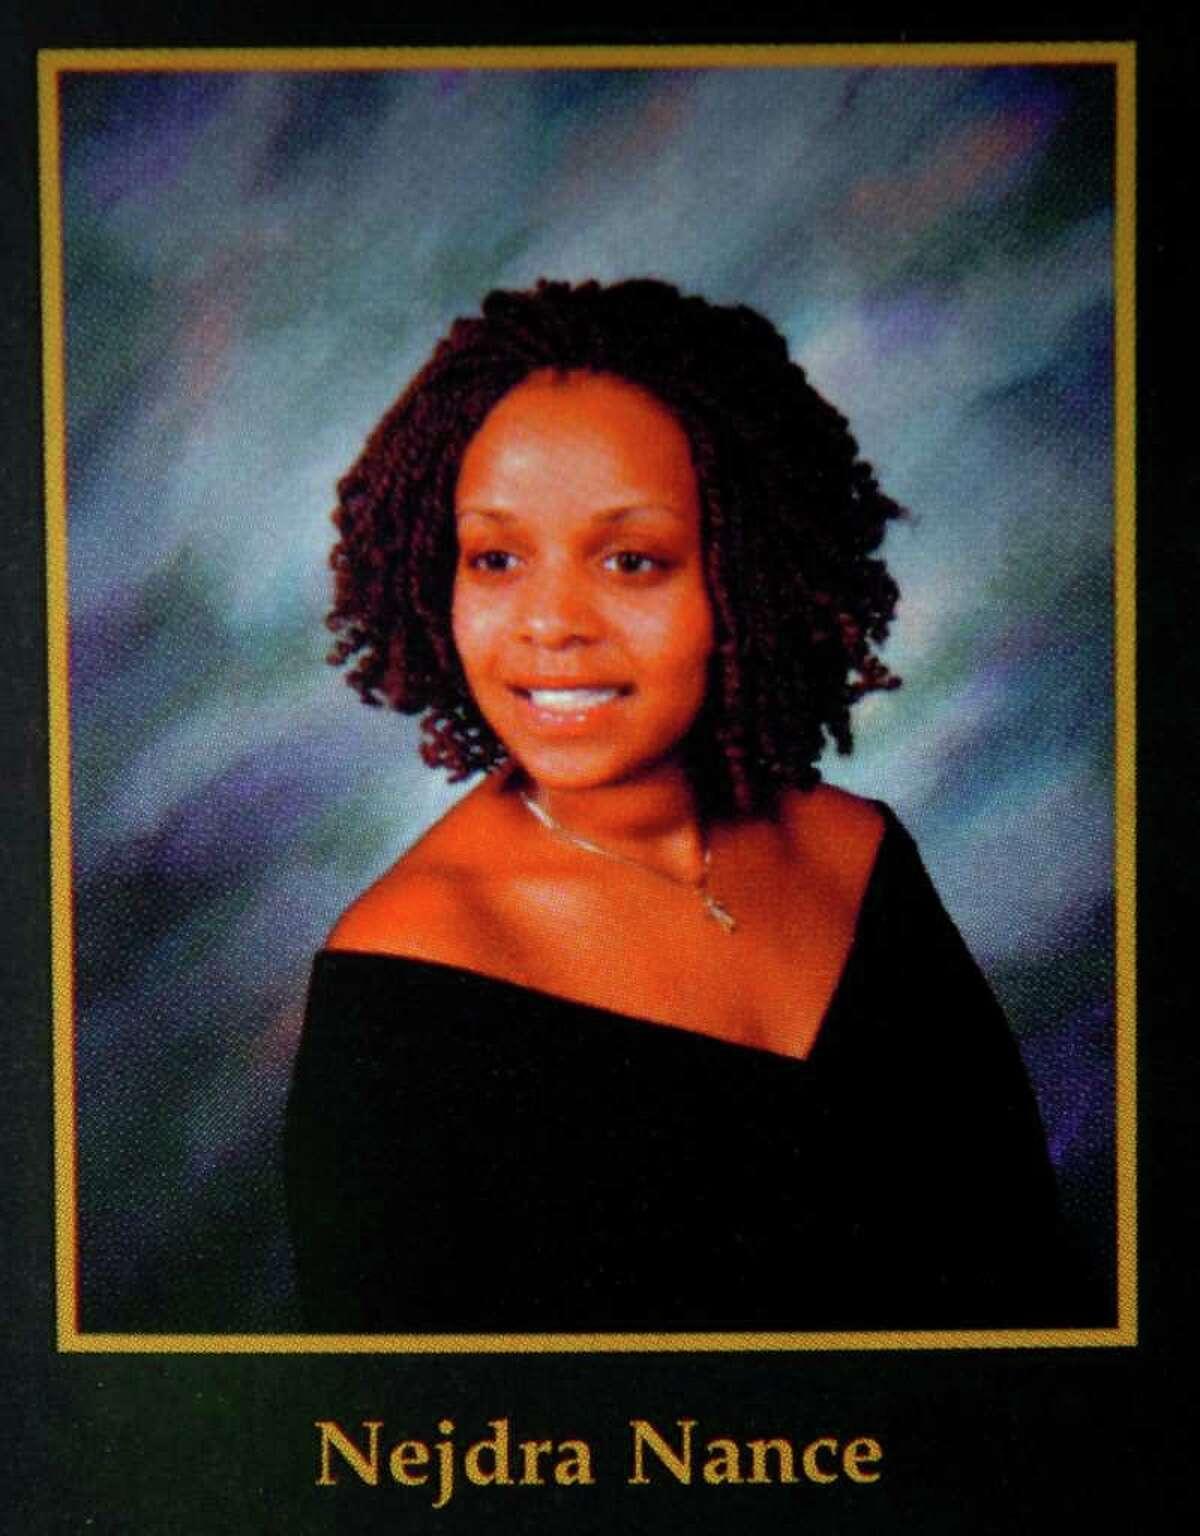 Nejdra Nance (Carlina White) in the 2005 Harding High School Yearbook, Folio.